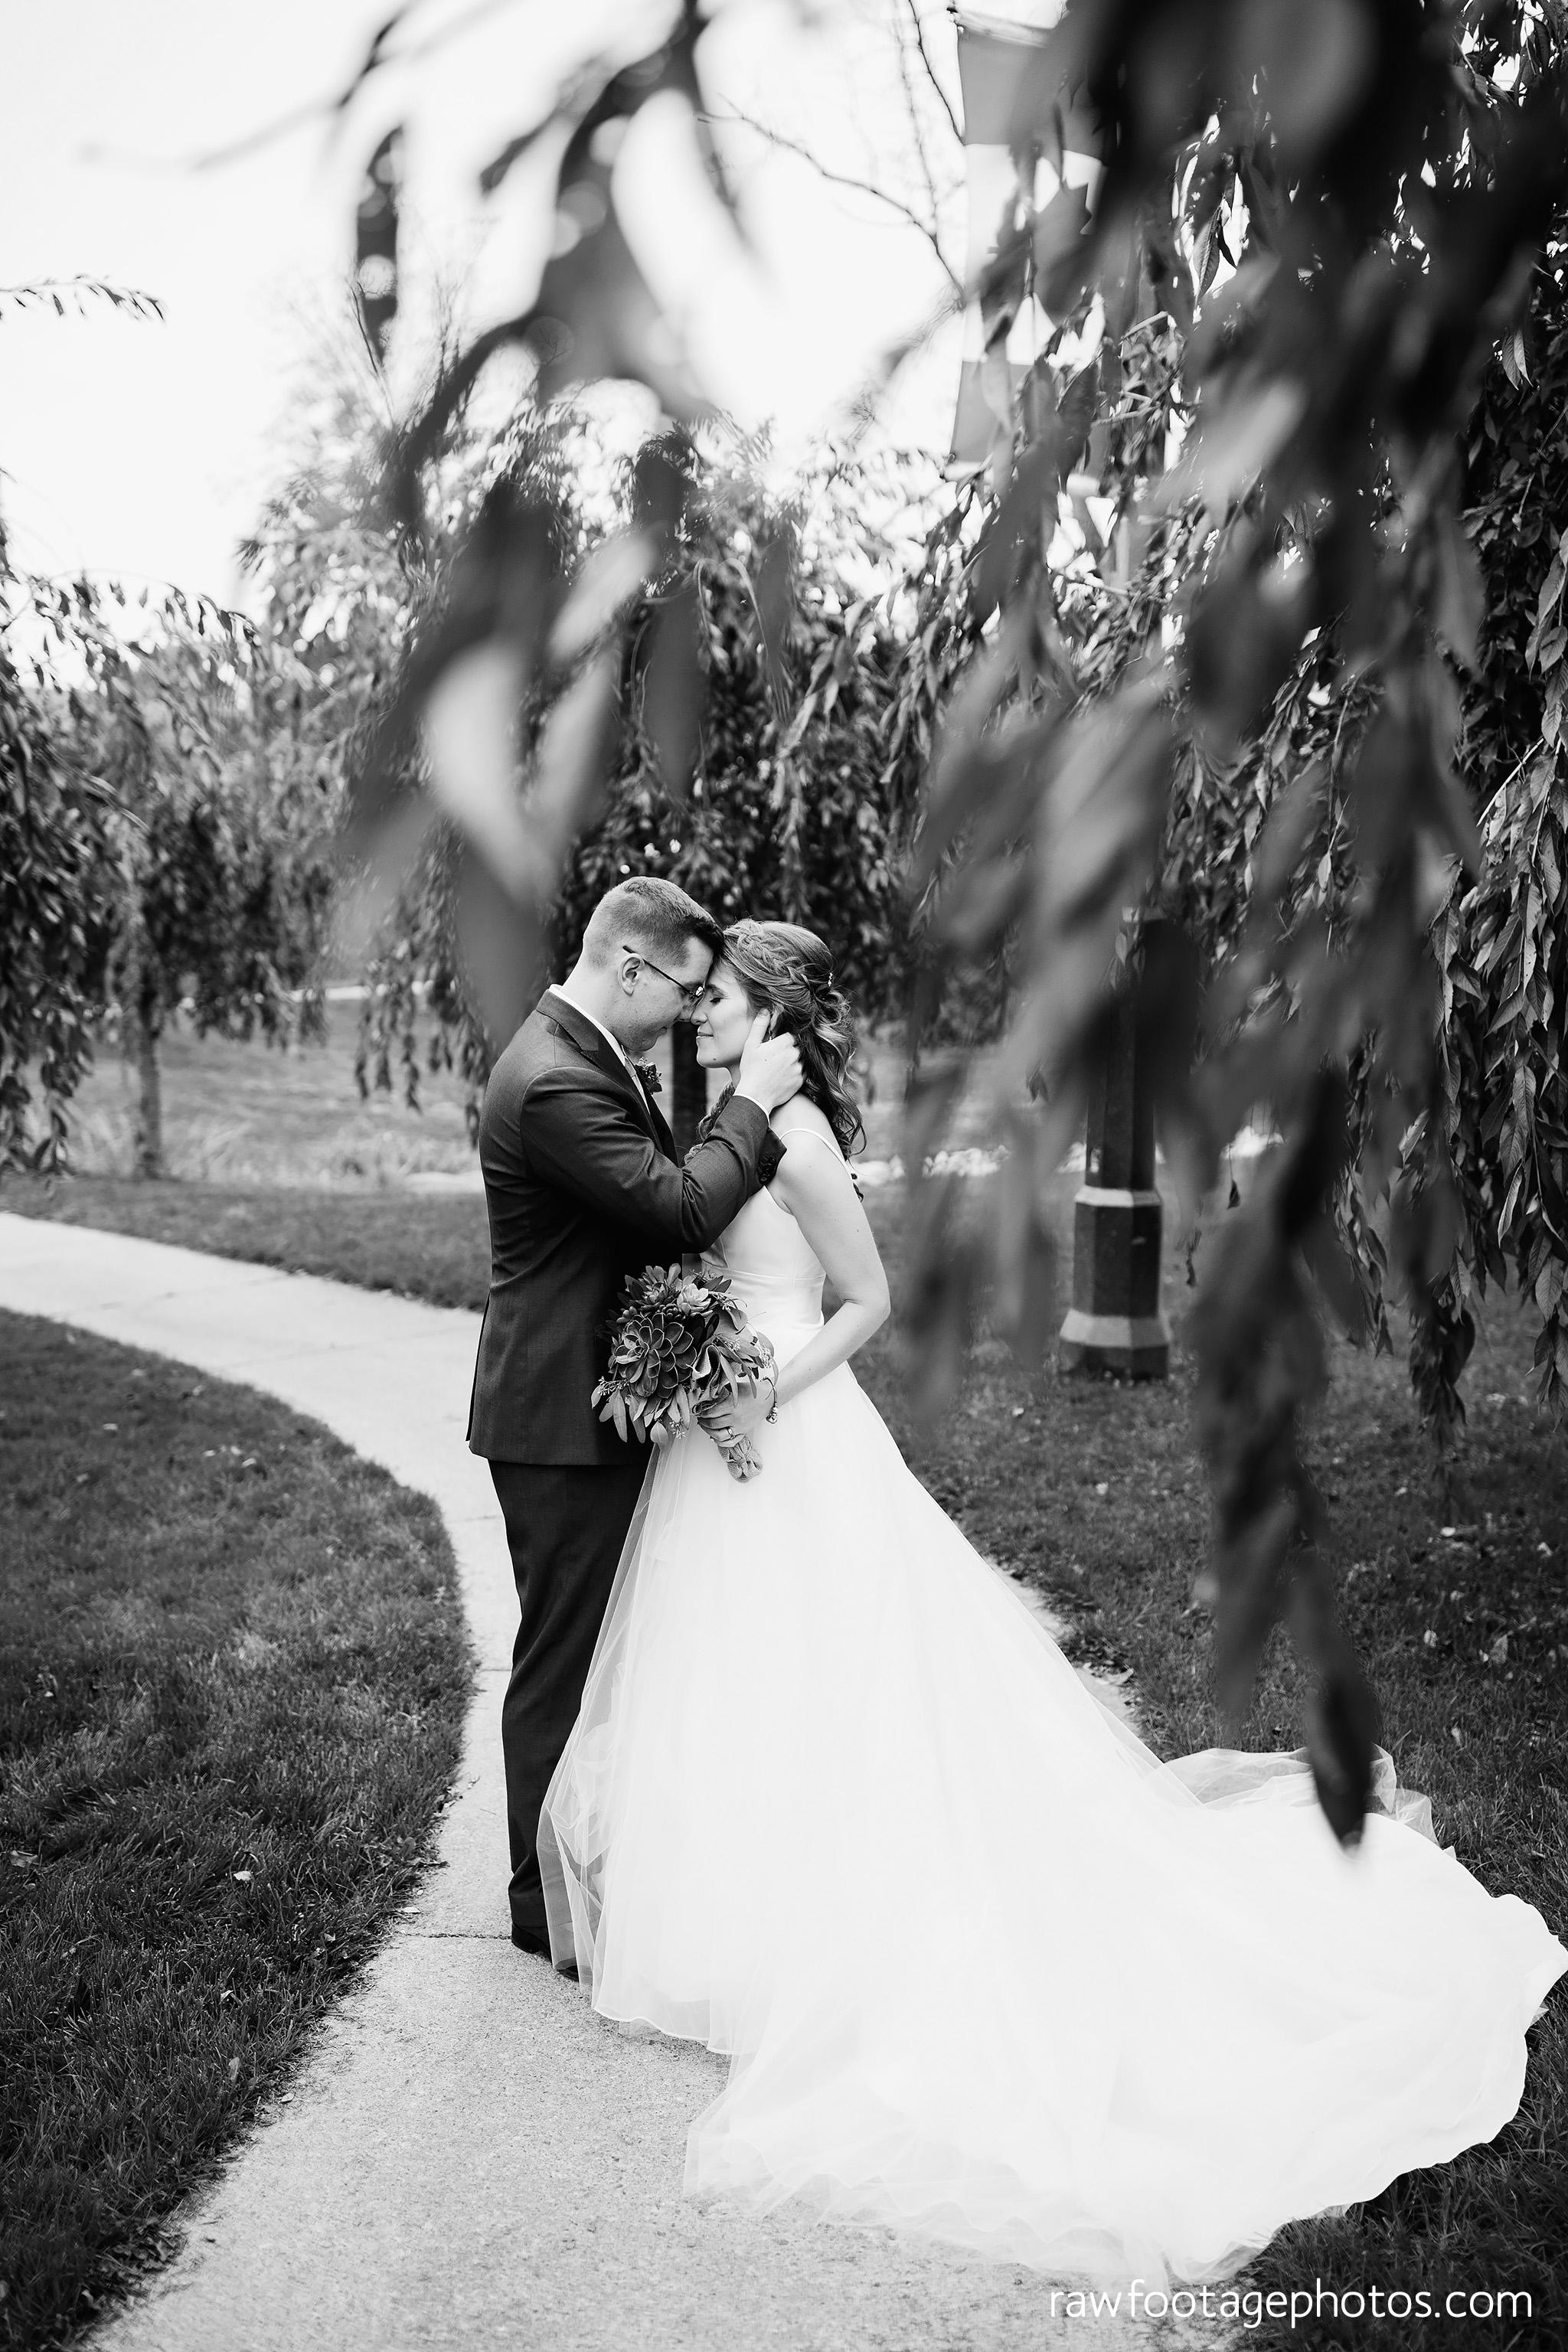 london_ontario_wedding_photographer-civic_gardens-springbank_park-succulent_bouquet-fall_wedding-bridge-raw_footage_photography055.jpg